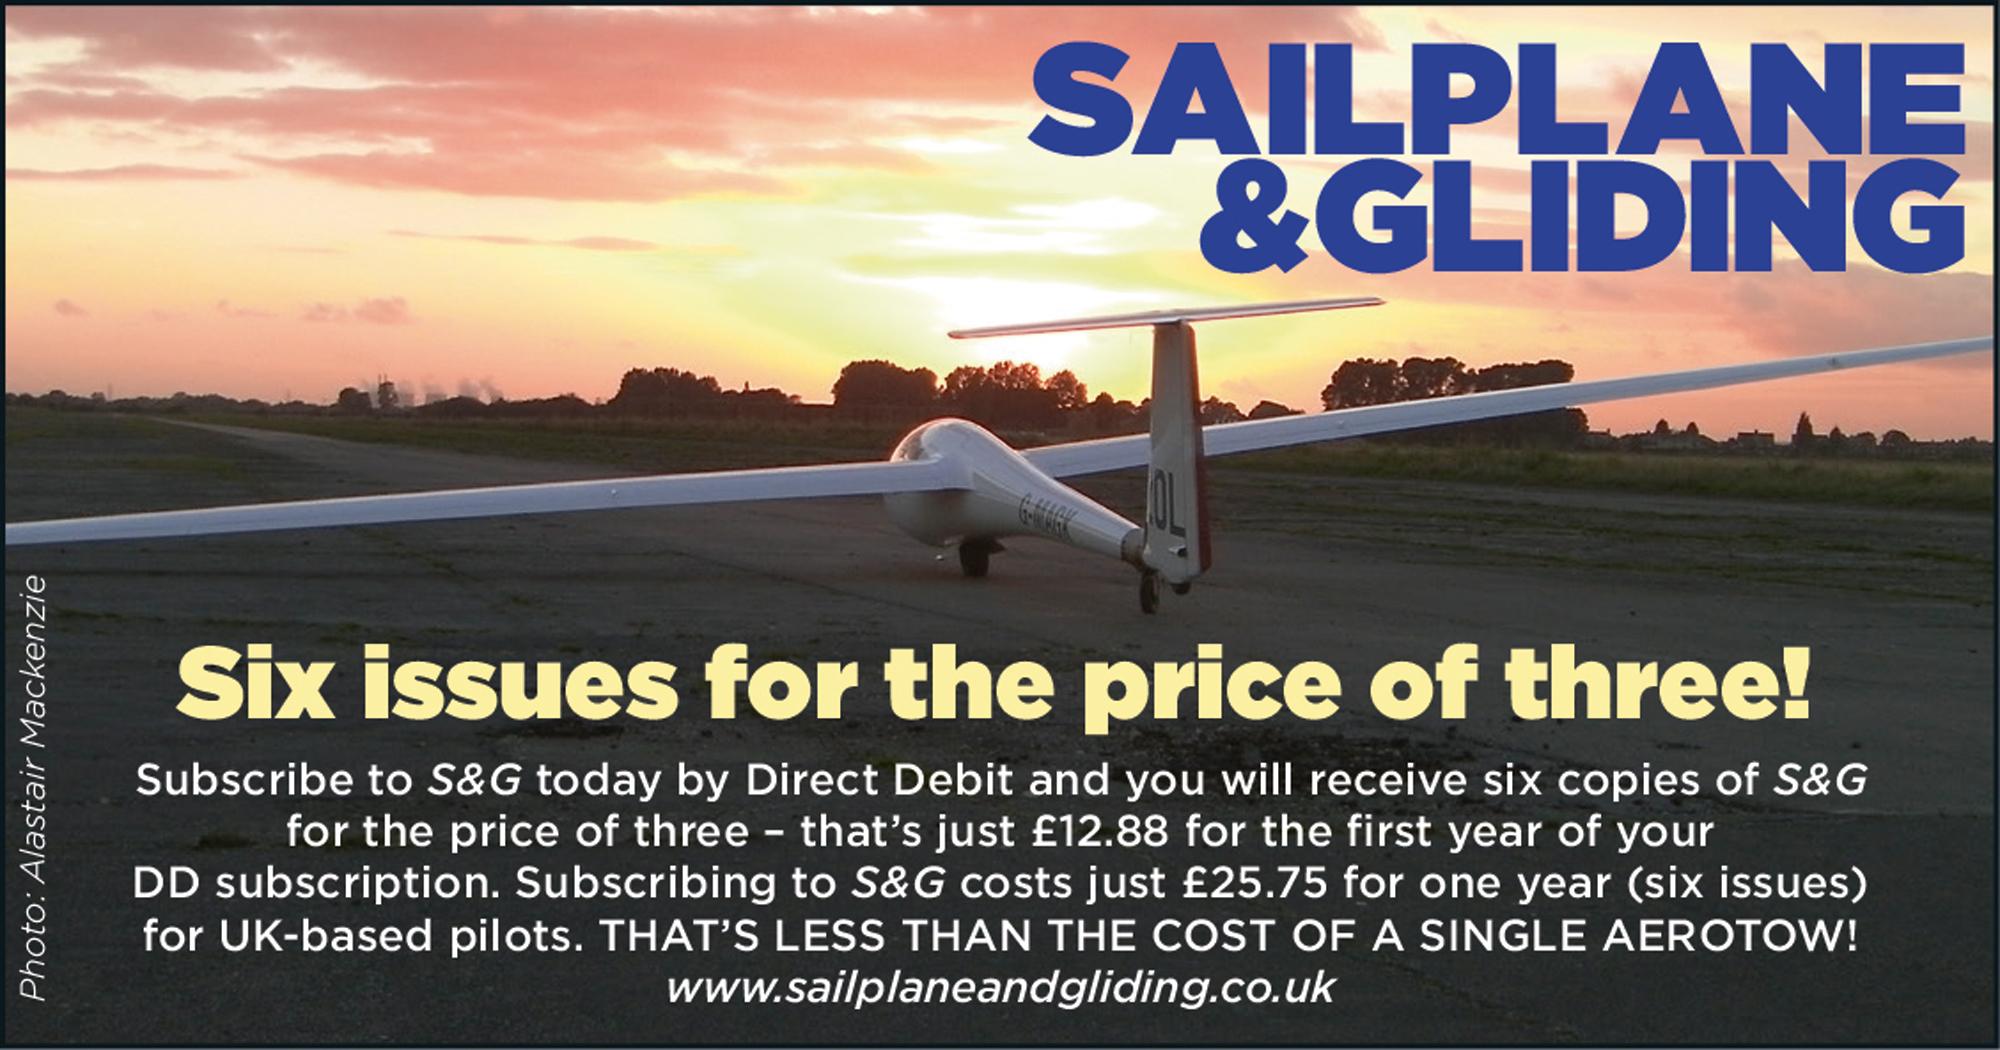 Sailplane and gliding